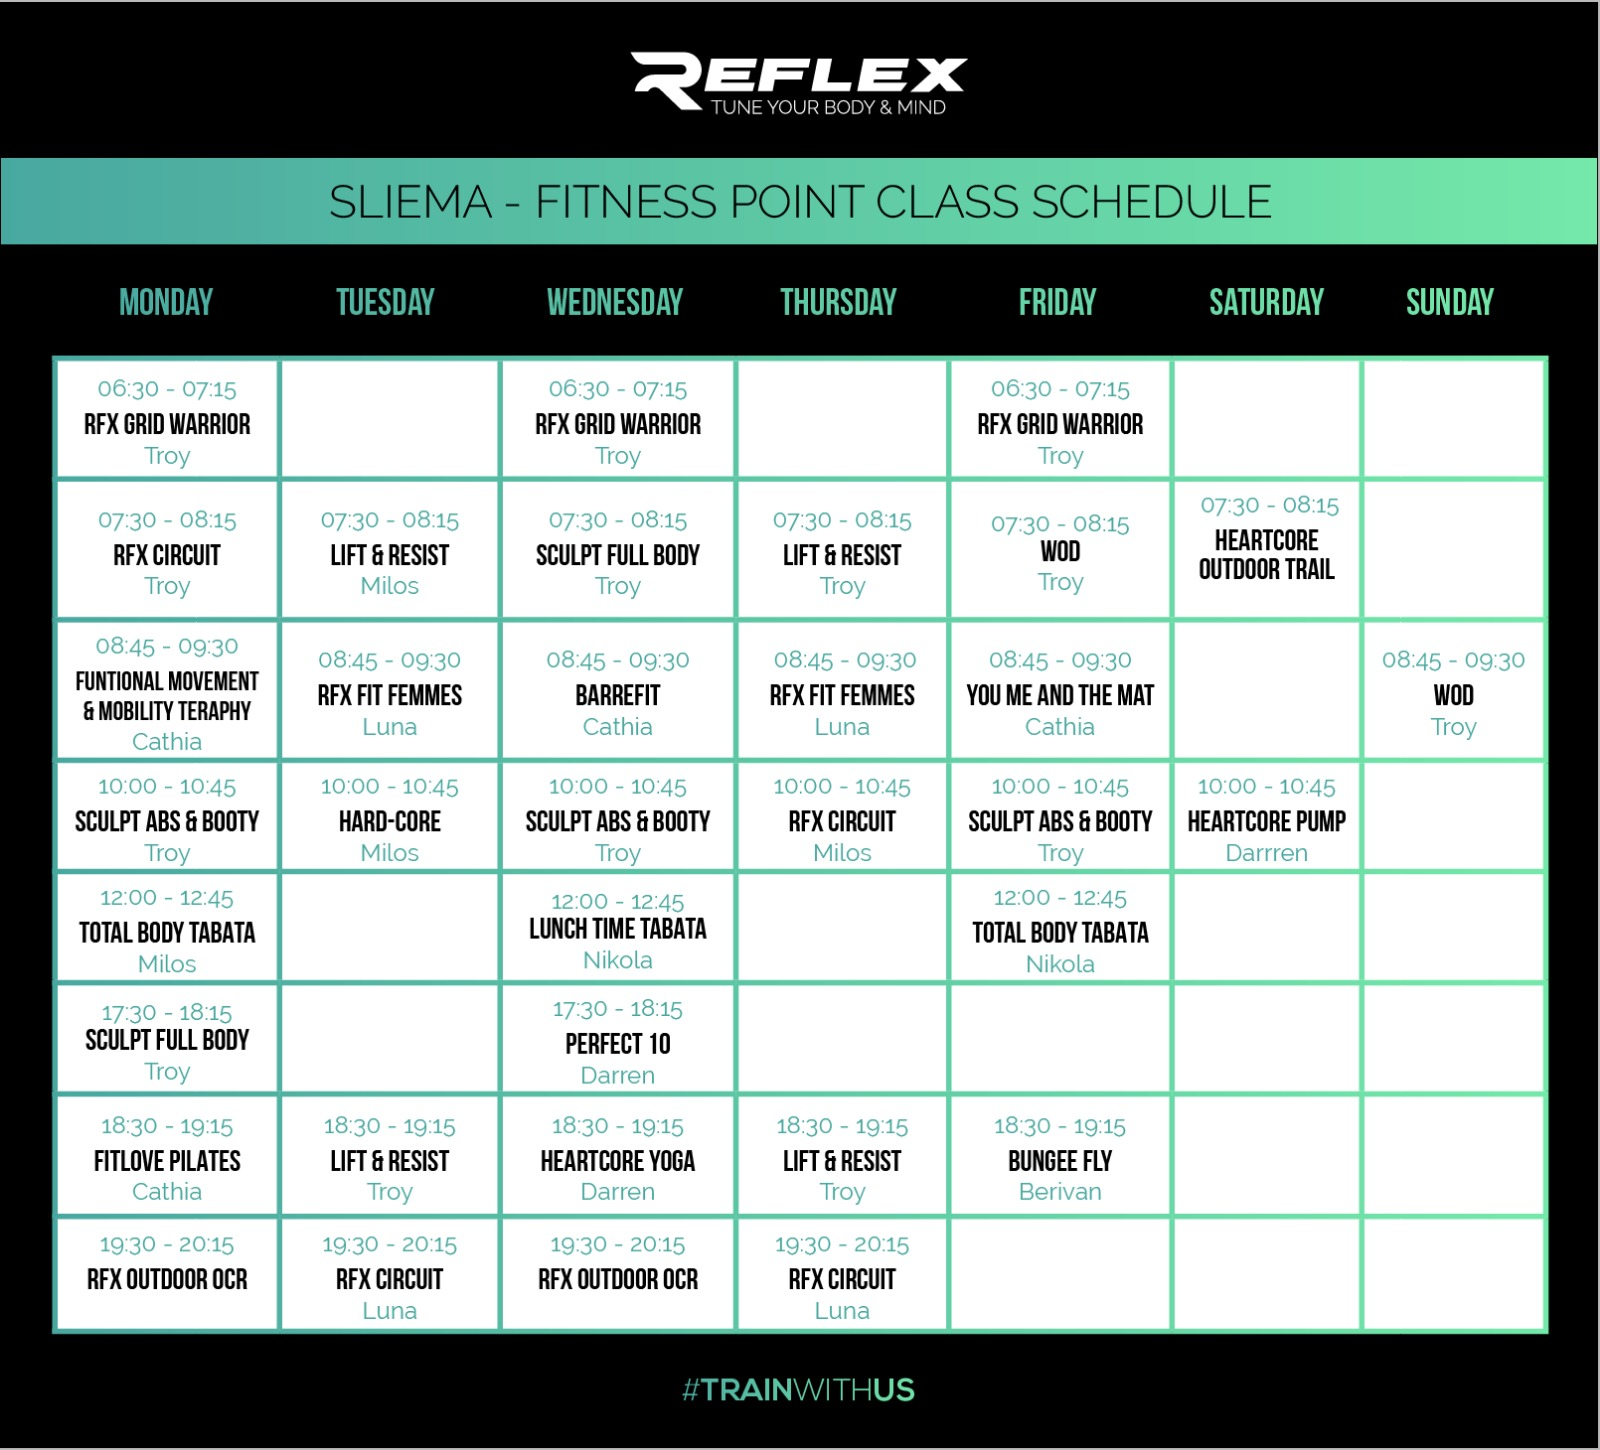 Reflex Sliema Classes